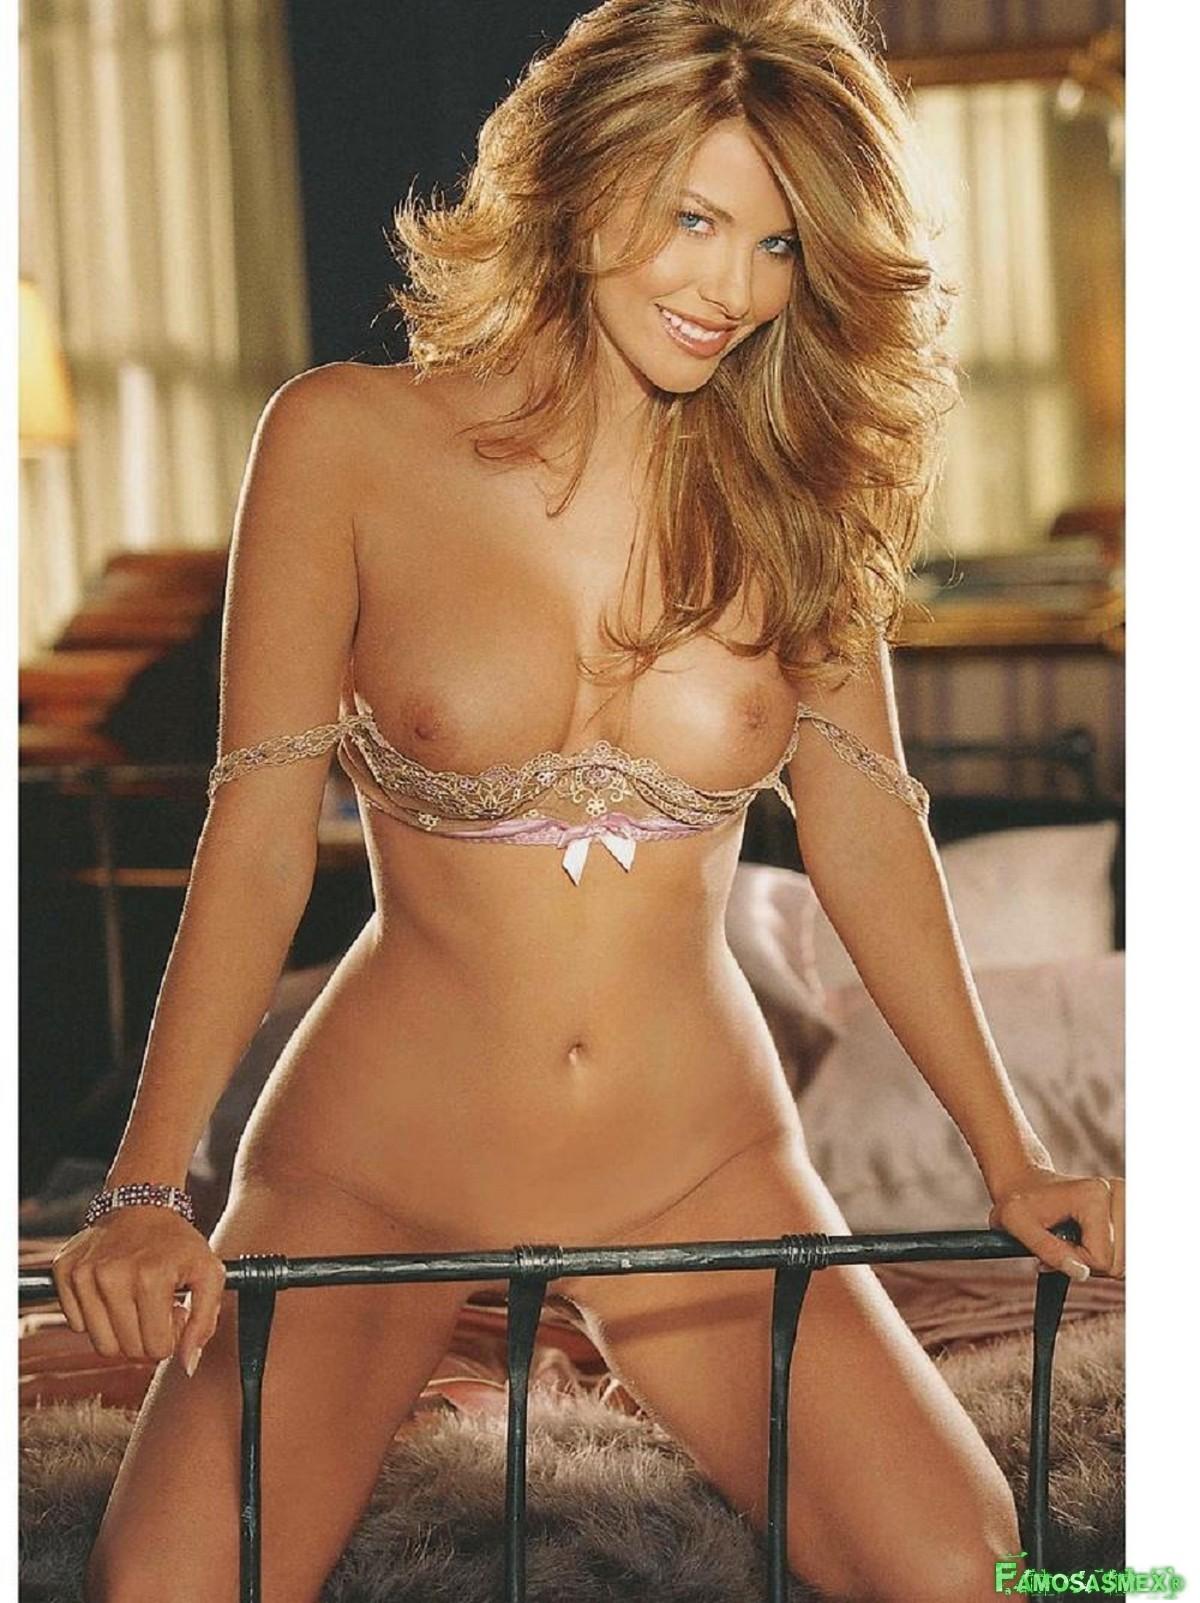 Mariah carey culo desnudo